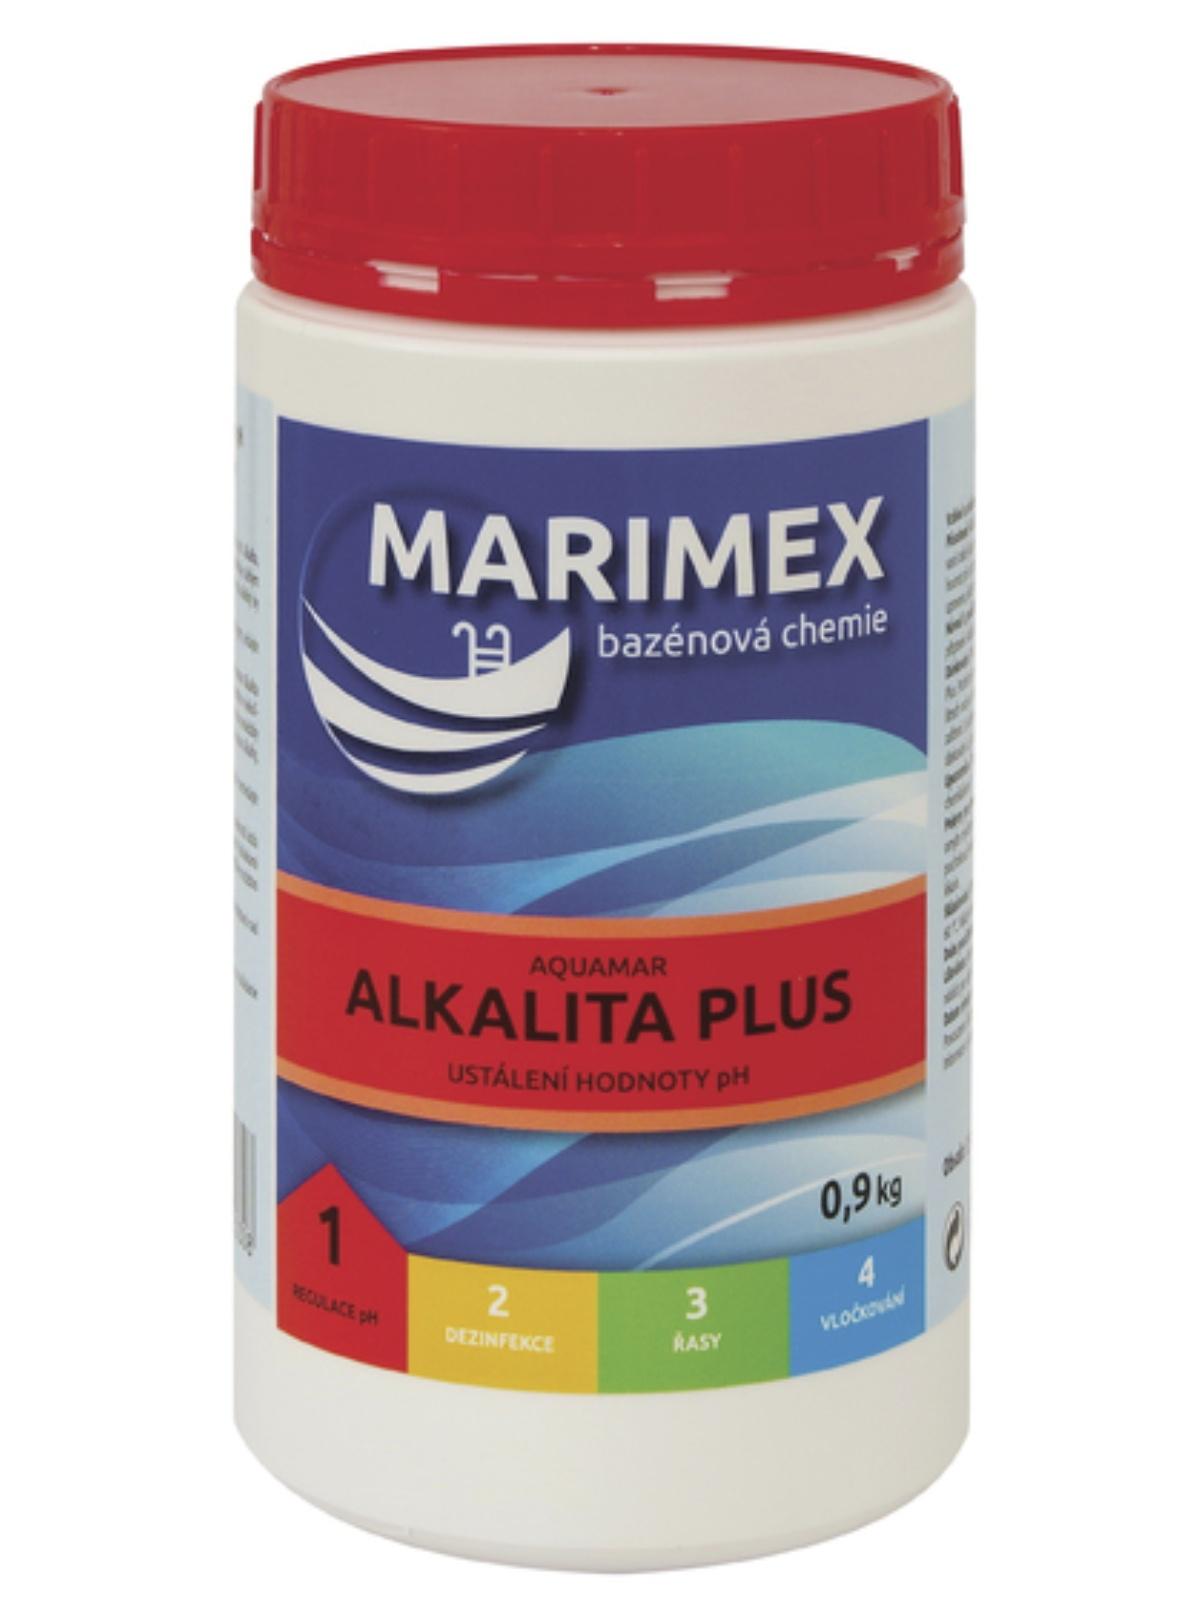 MARIMEX 11313112 Aquamar Alkalita plus 900g